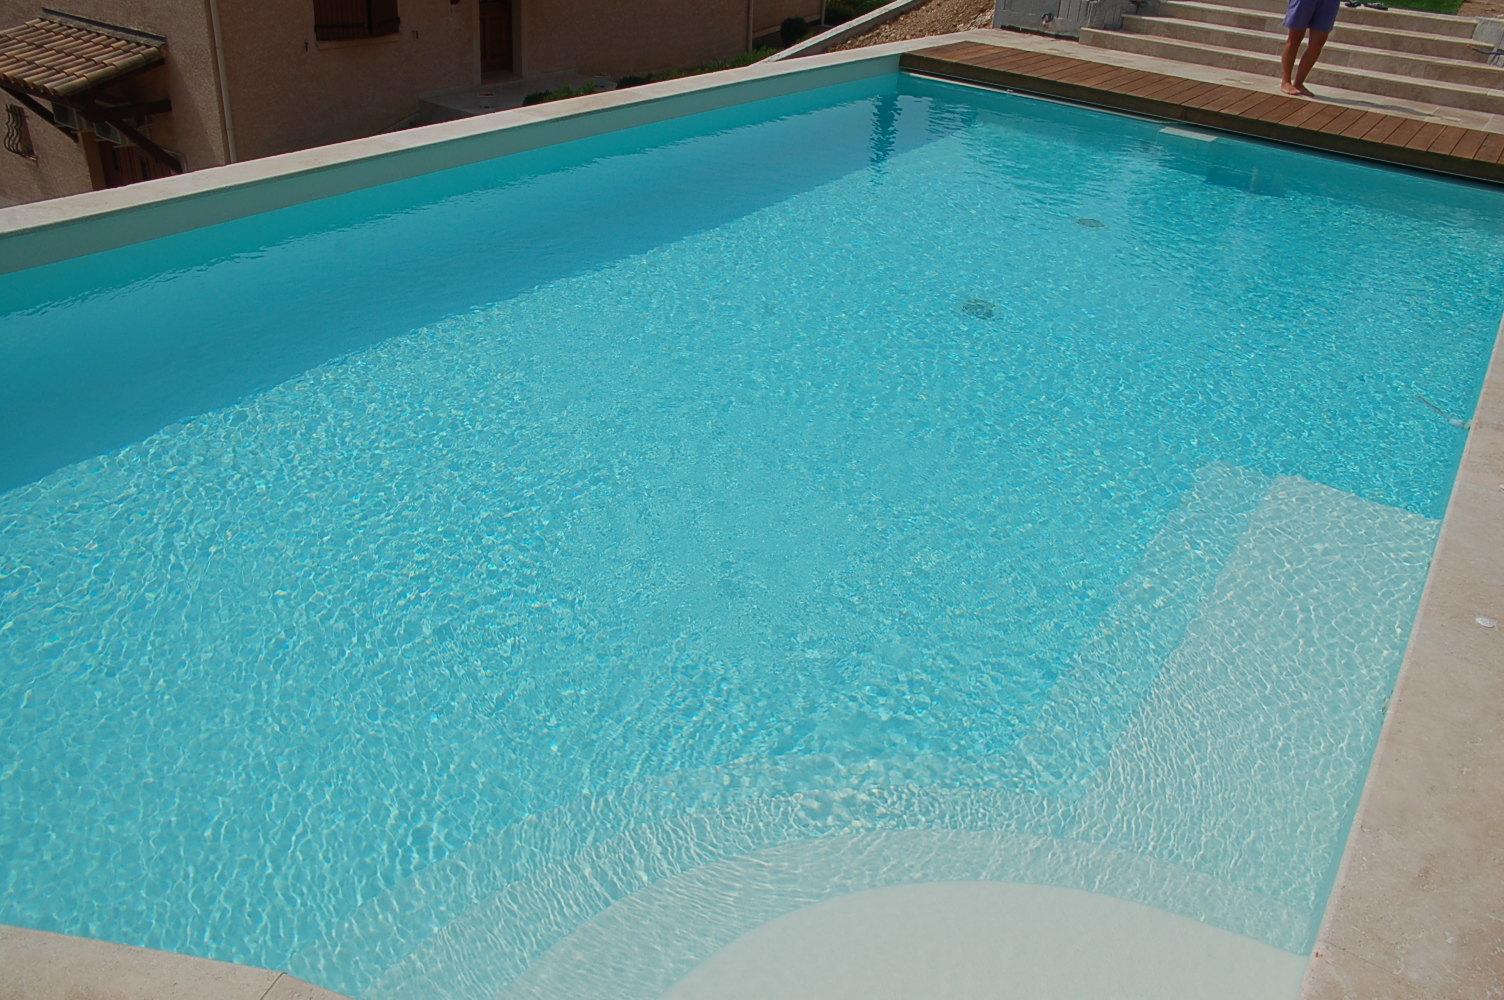 Piscines enterr es votre piscine permanente kopec - Piscine carrelage ou liner montpellier ...